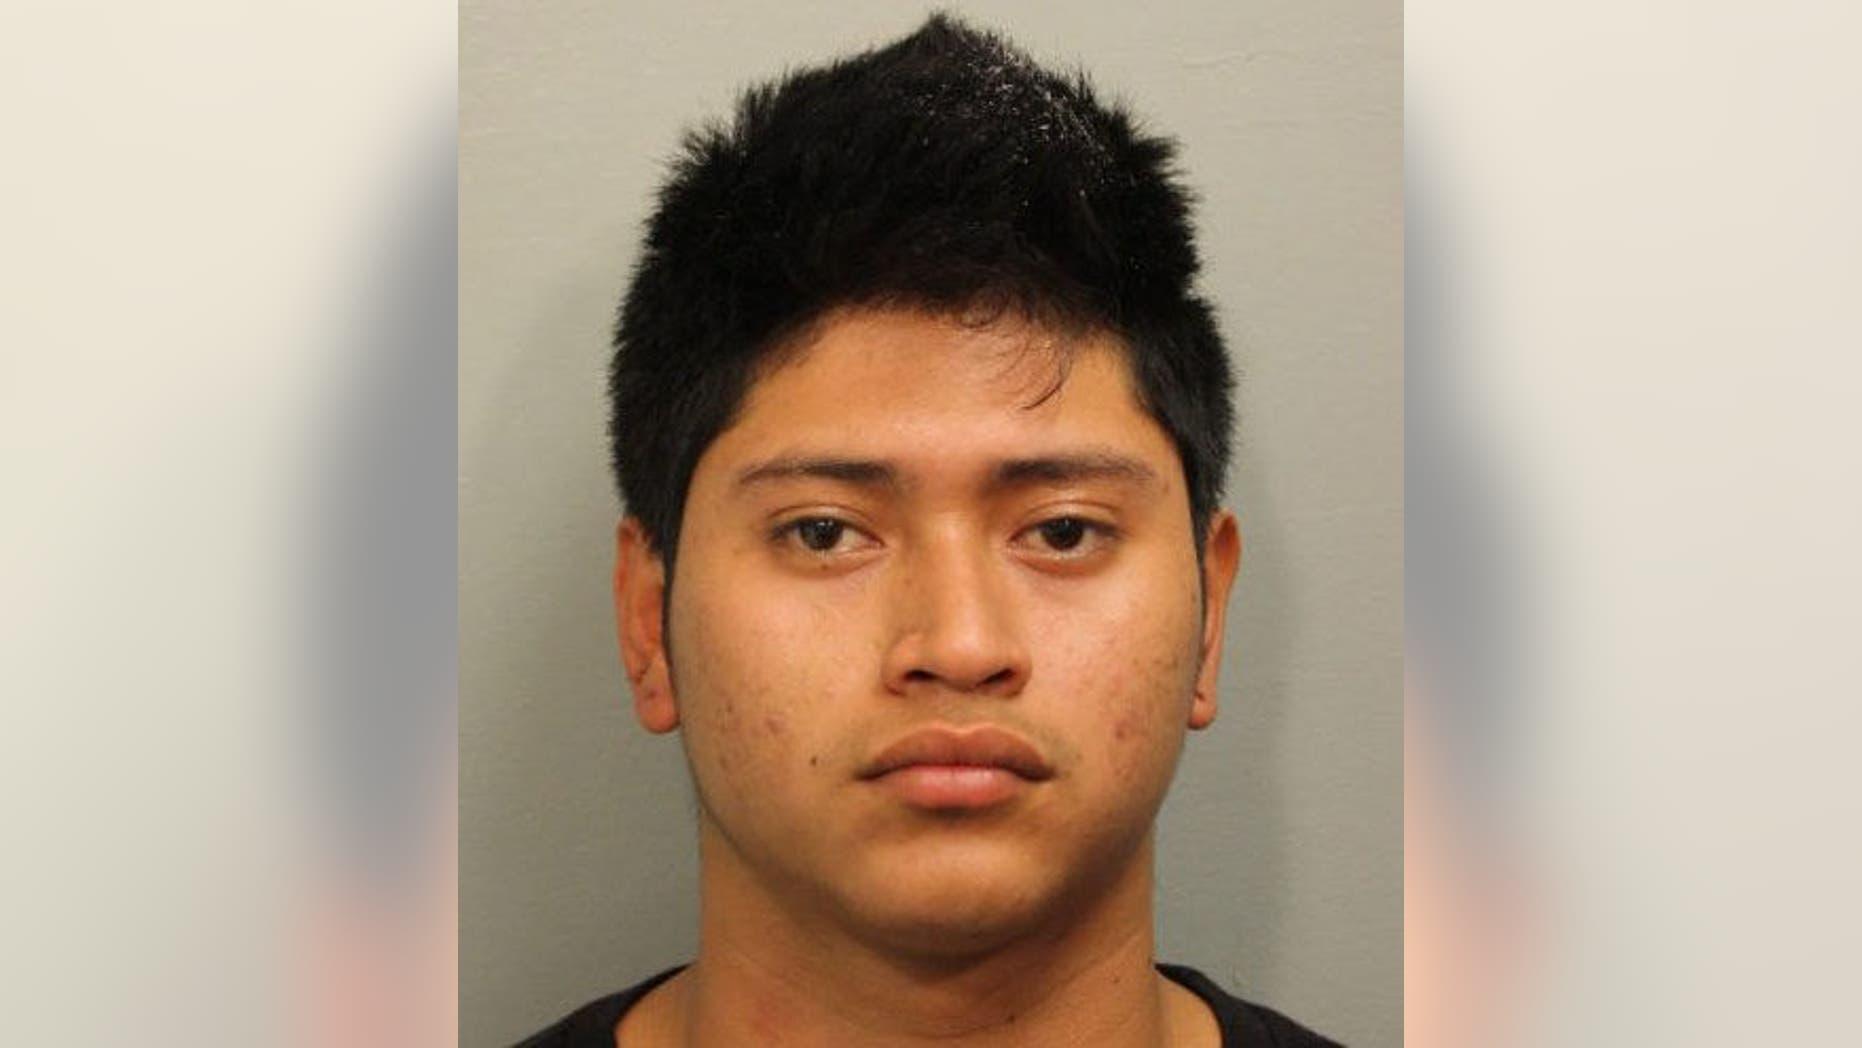 MS-13 gang member wanted in 2 Texas murders captured in